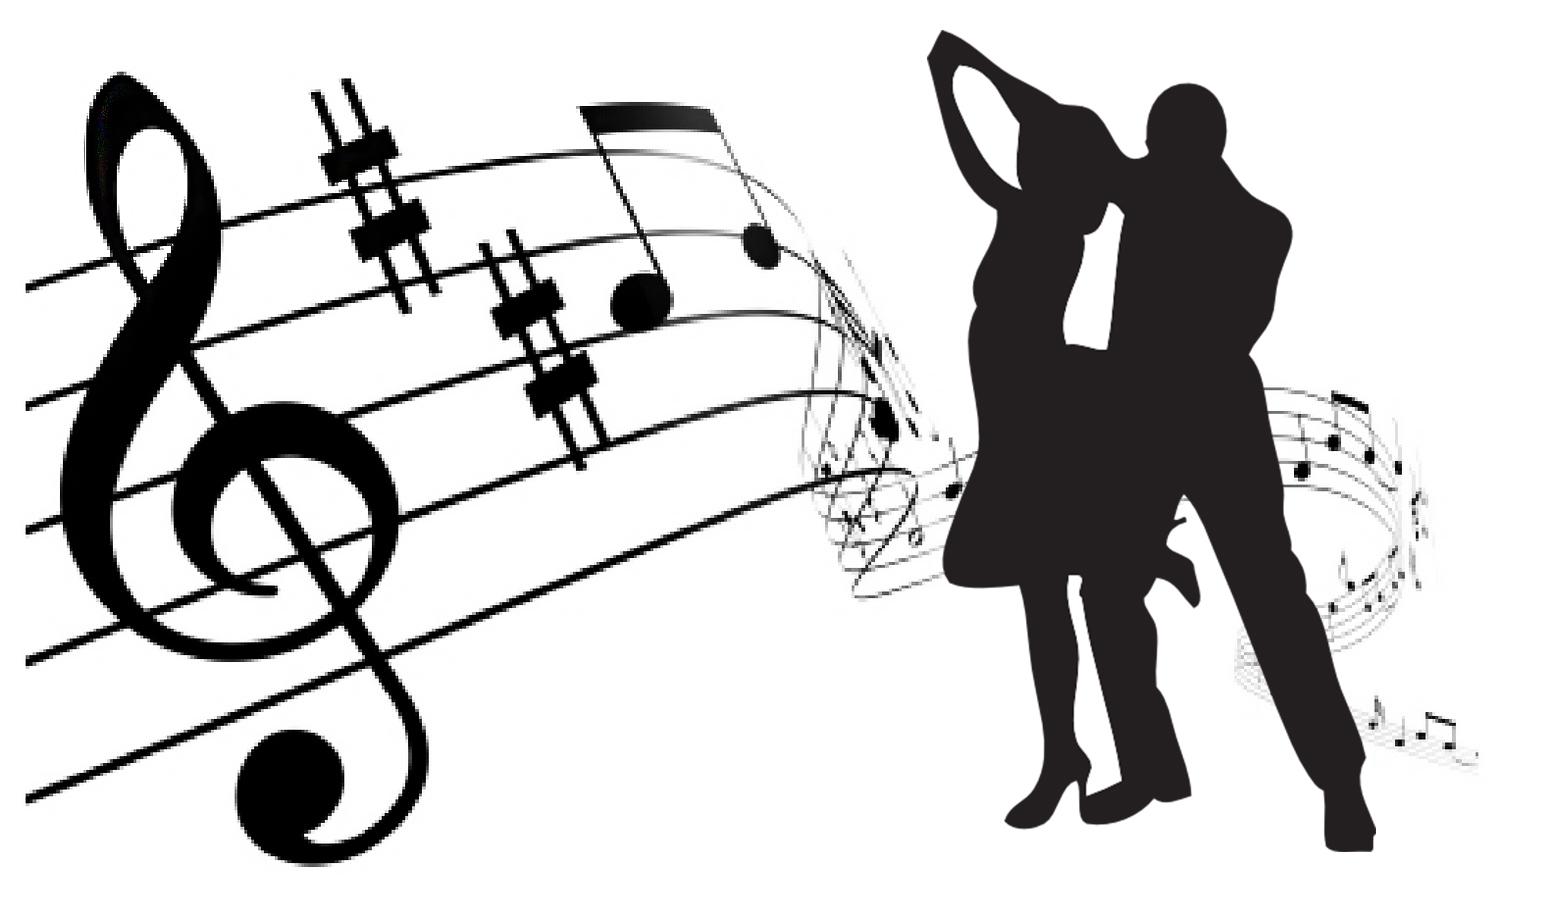 Latin clipart Clipart Clipart tango Desing